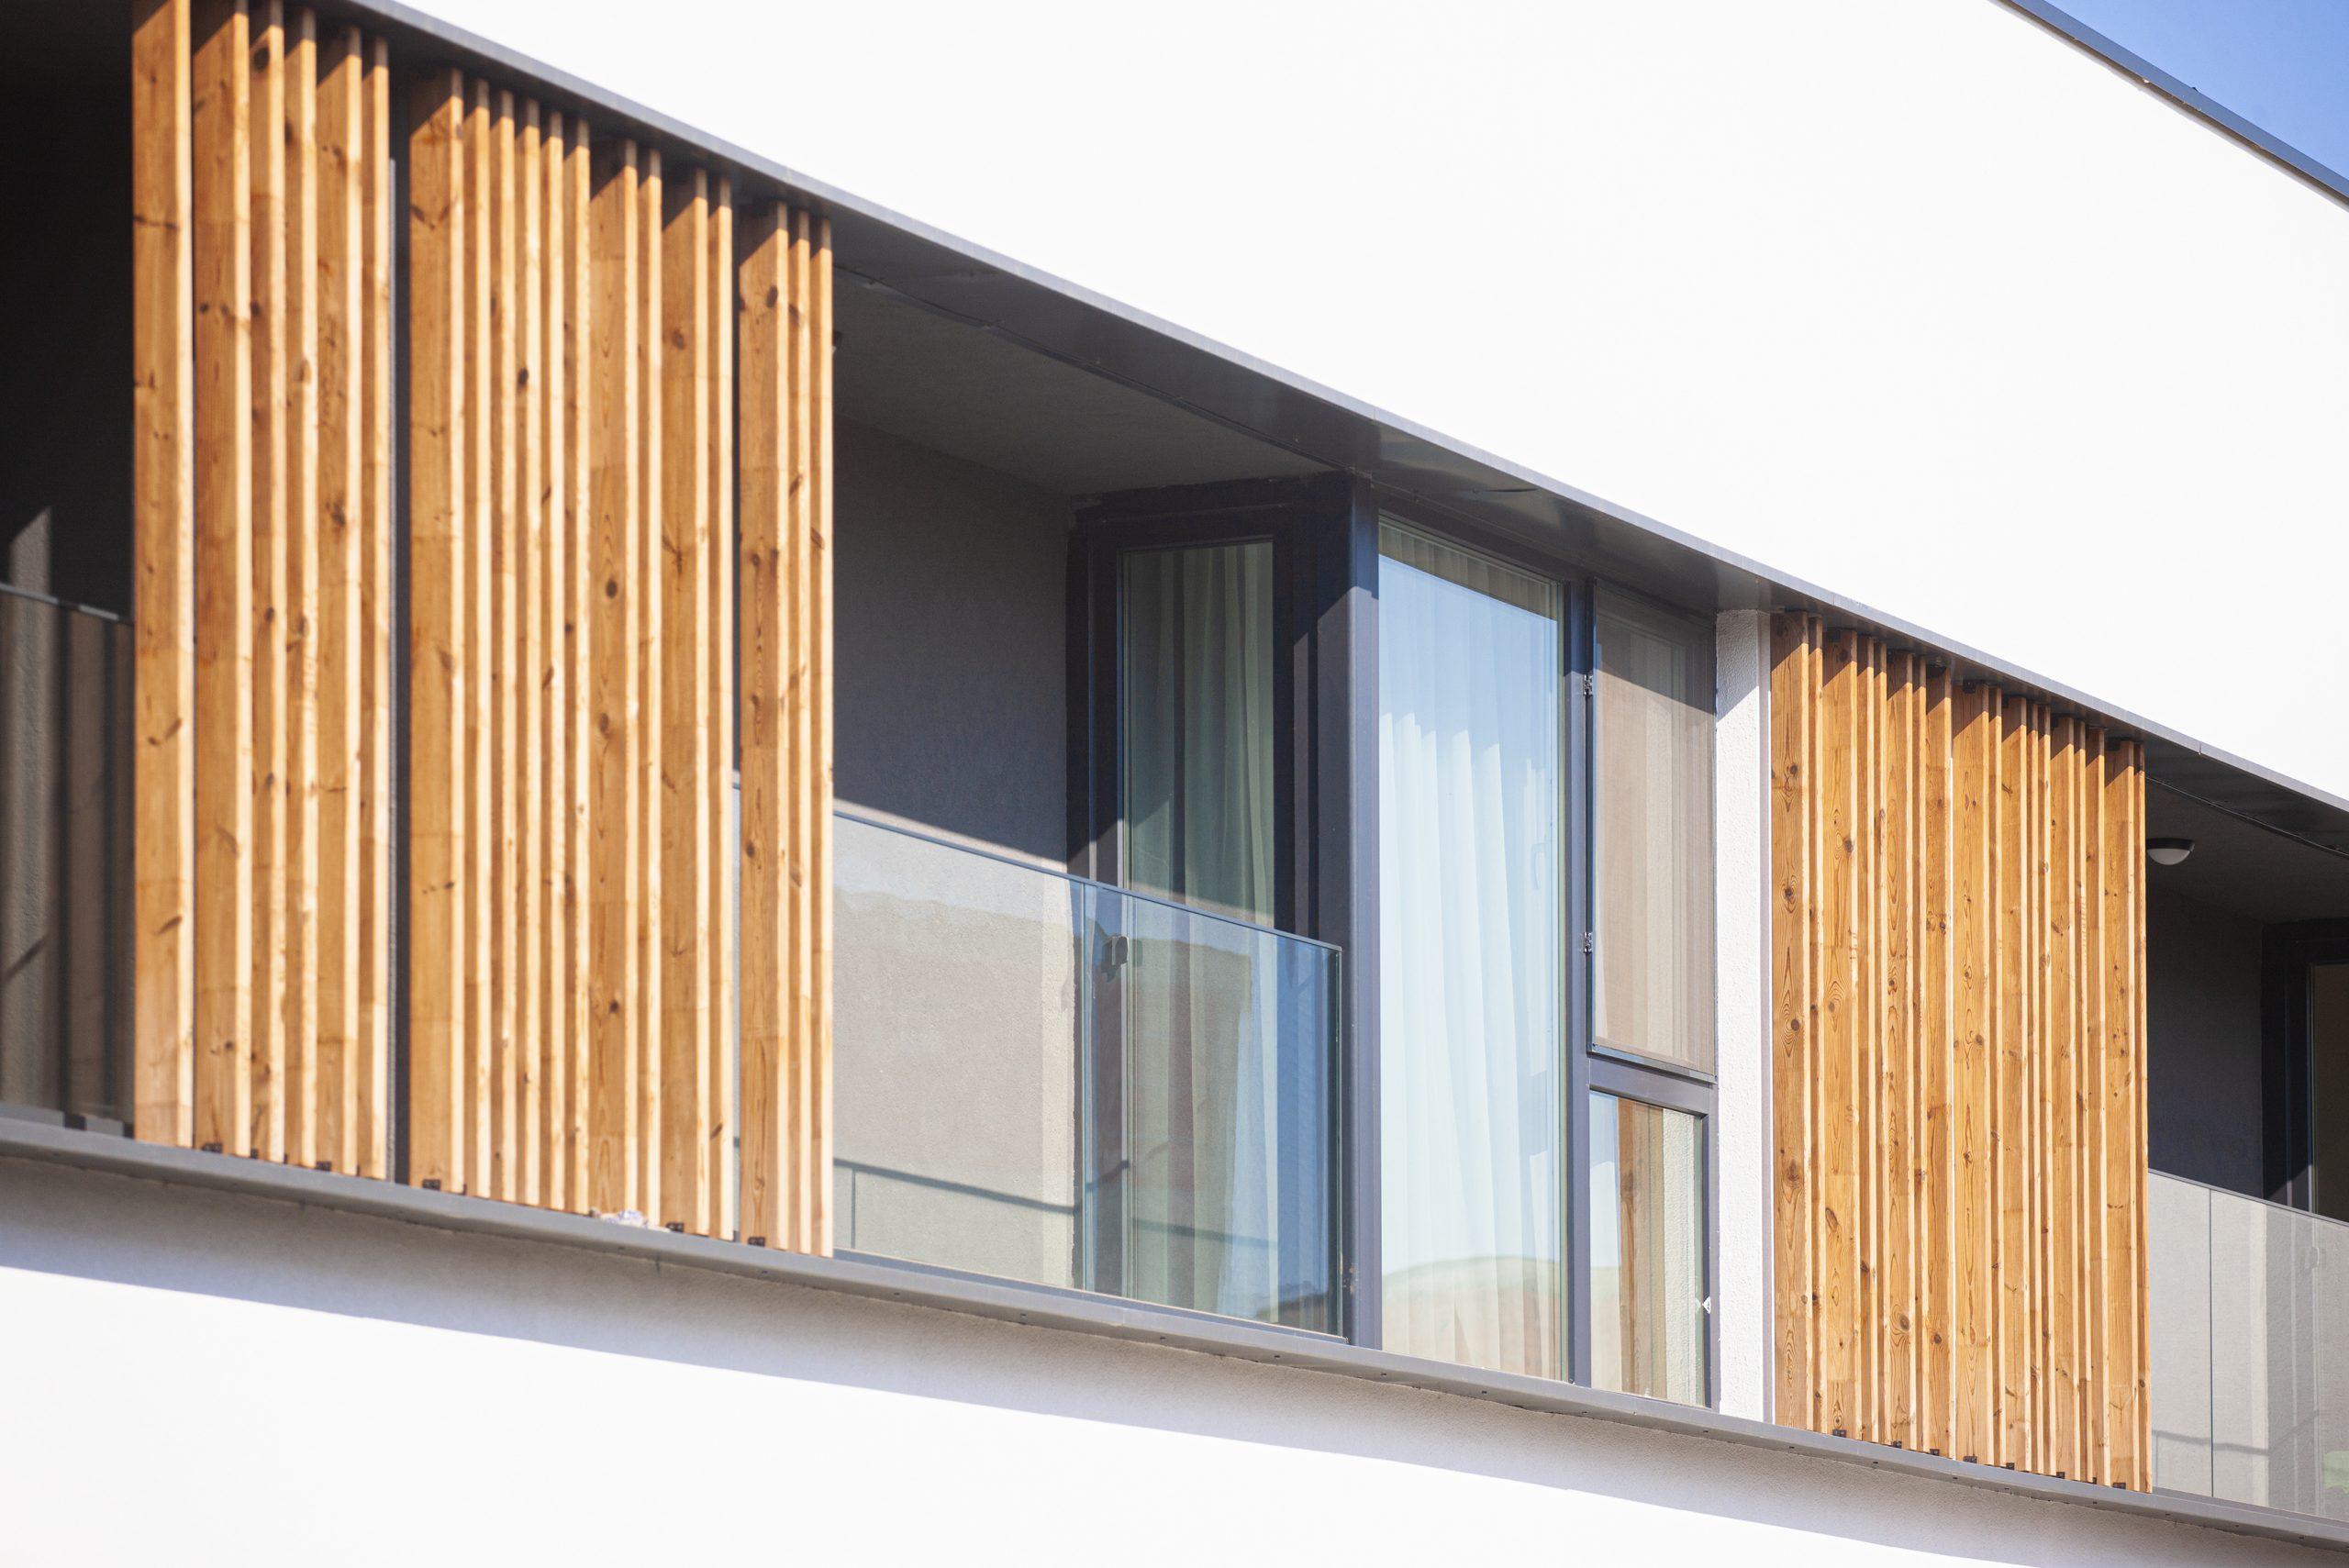 https://nbc-arhitect.ro/wp-content/uploads/2020/10/NBC-Arhitect-_-residentials-_-Contemporan-Residence-_-Bucharest-Romania_8-1-scaled.jpg